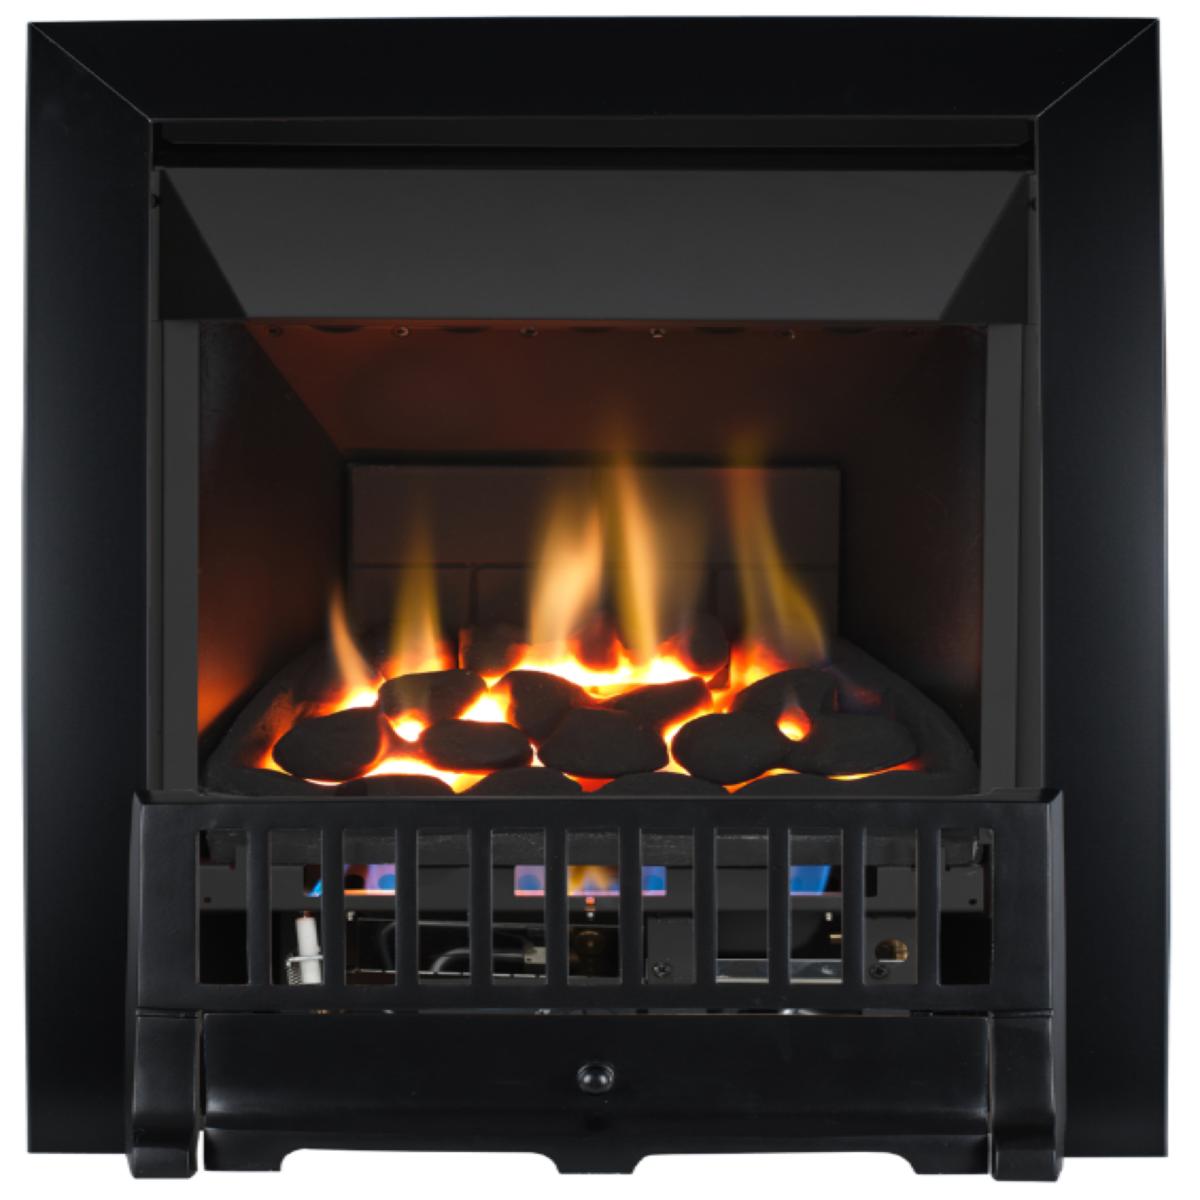 Focal Point Fires Farlam High Efficiency Gas Fire - Black